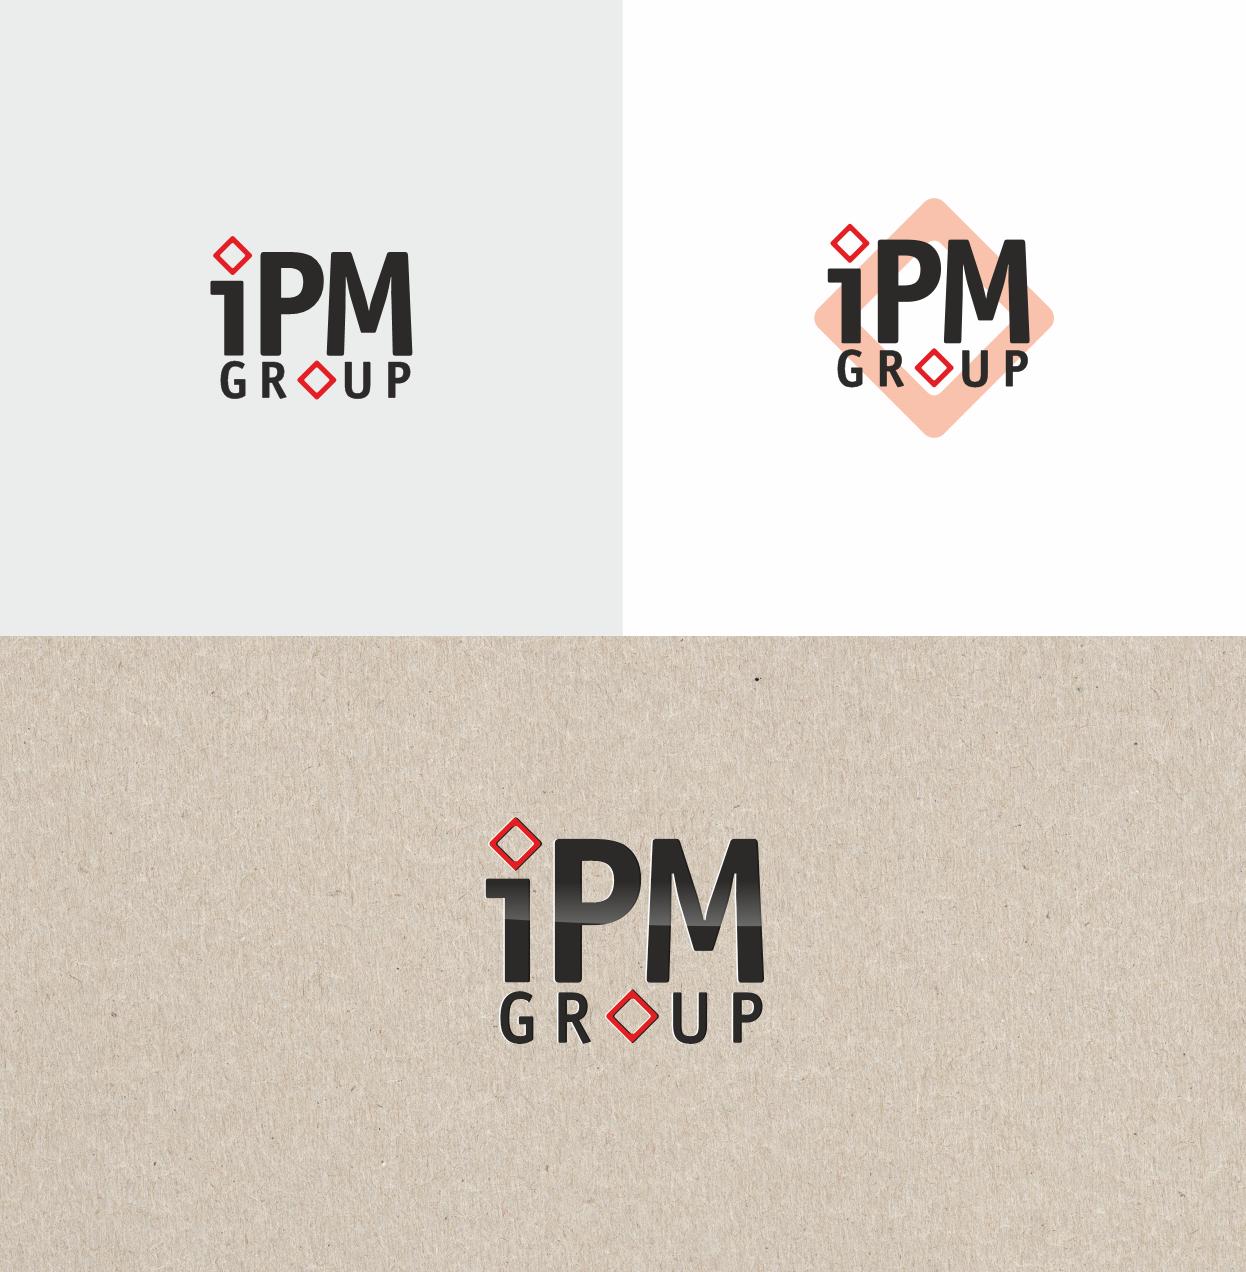 Разработка логотипа для управляющей компании фото f_2115f8536dac01f9.jpg